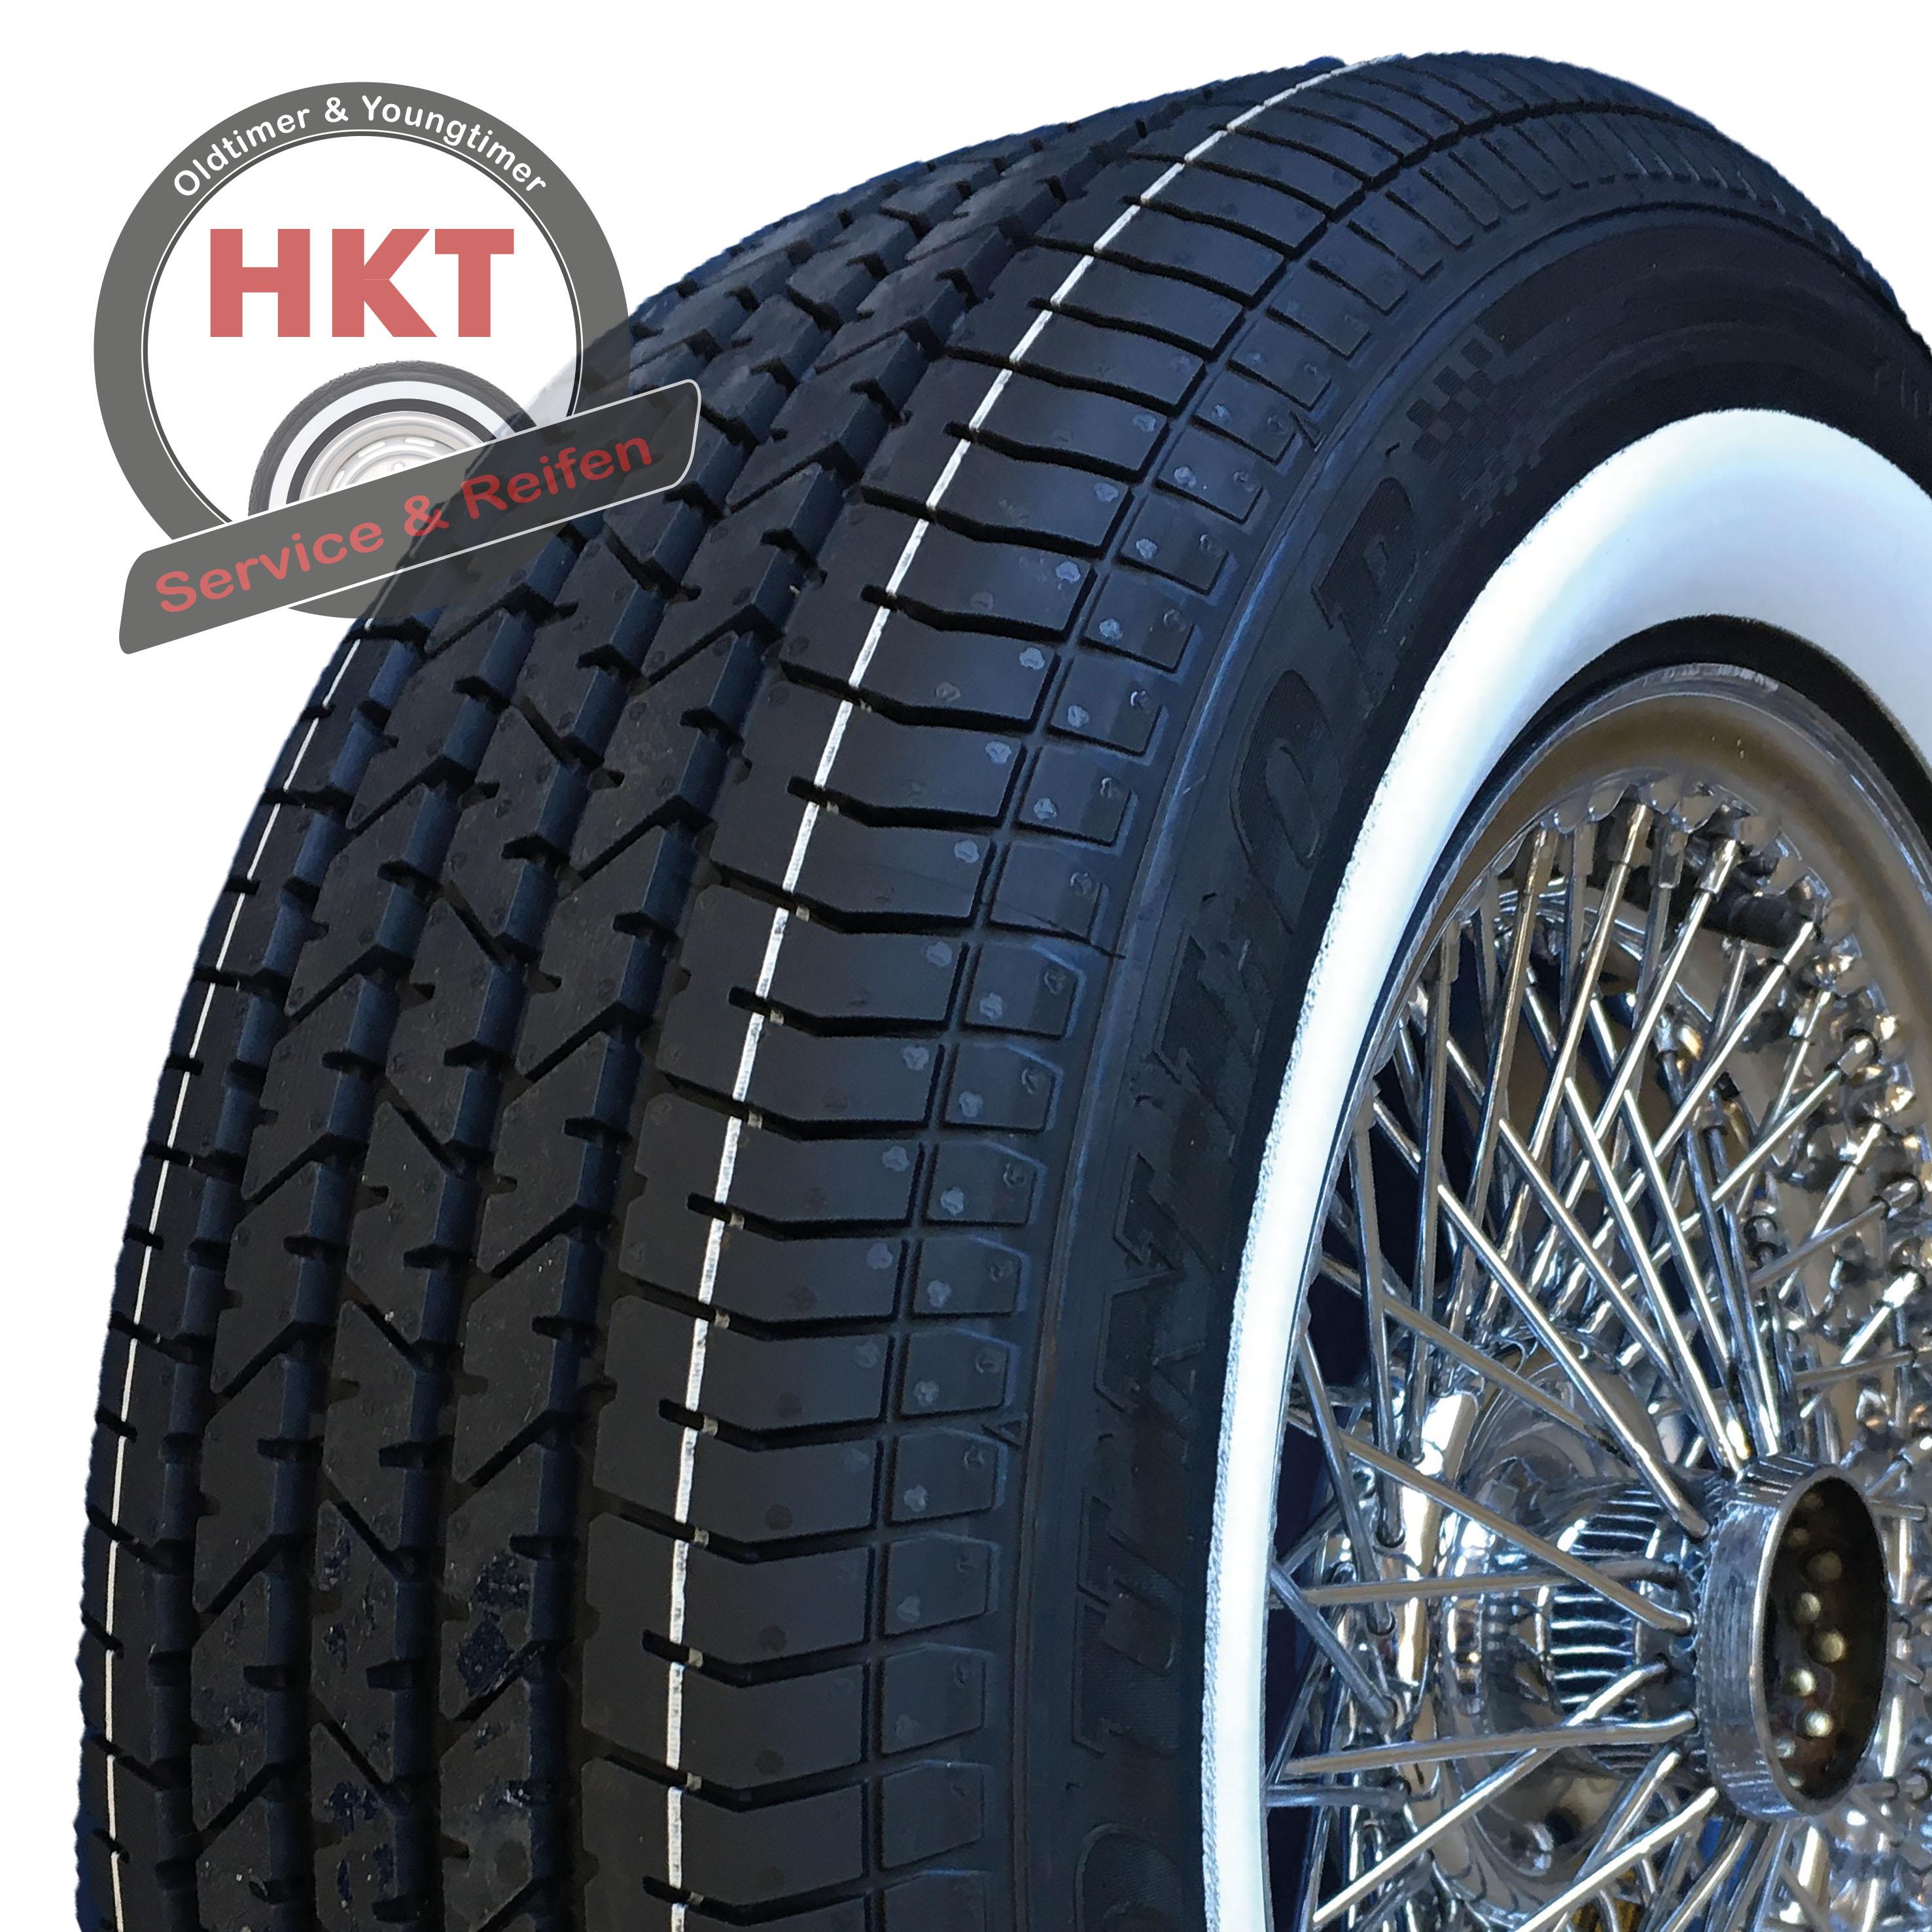 185/80R15 93W TL Dunlop Sport Classic ca. 40 mm Weißwand